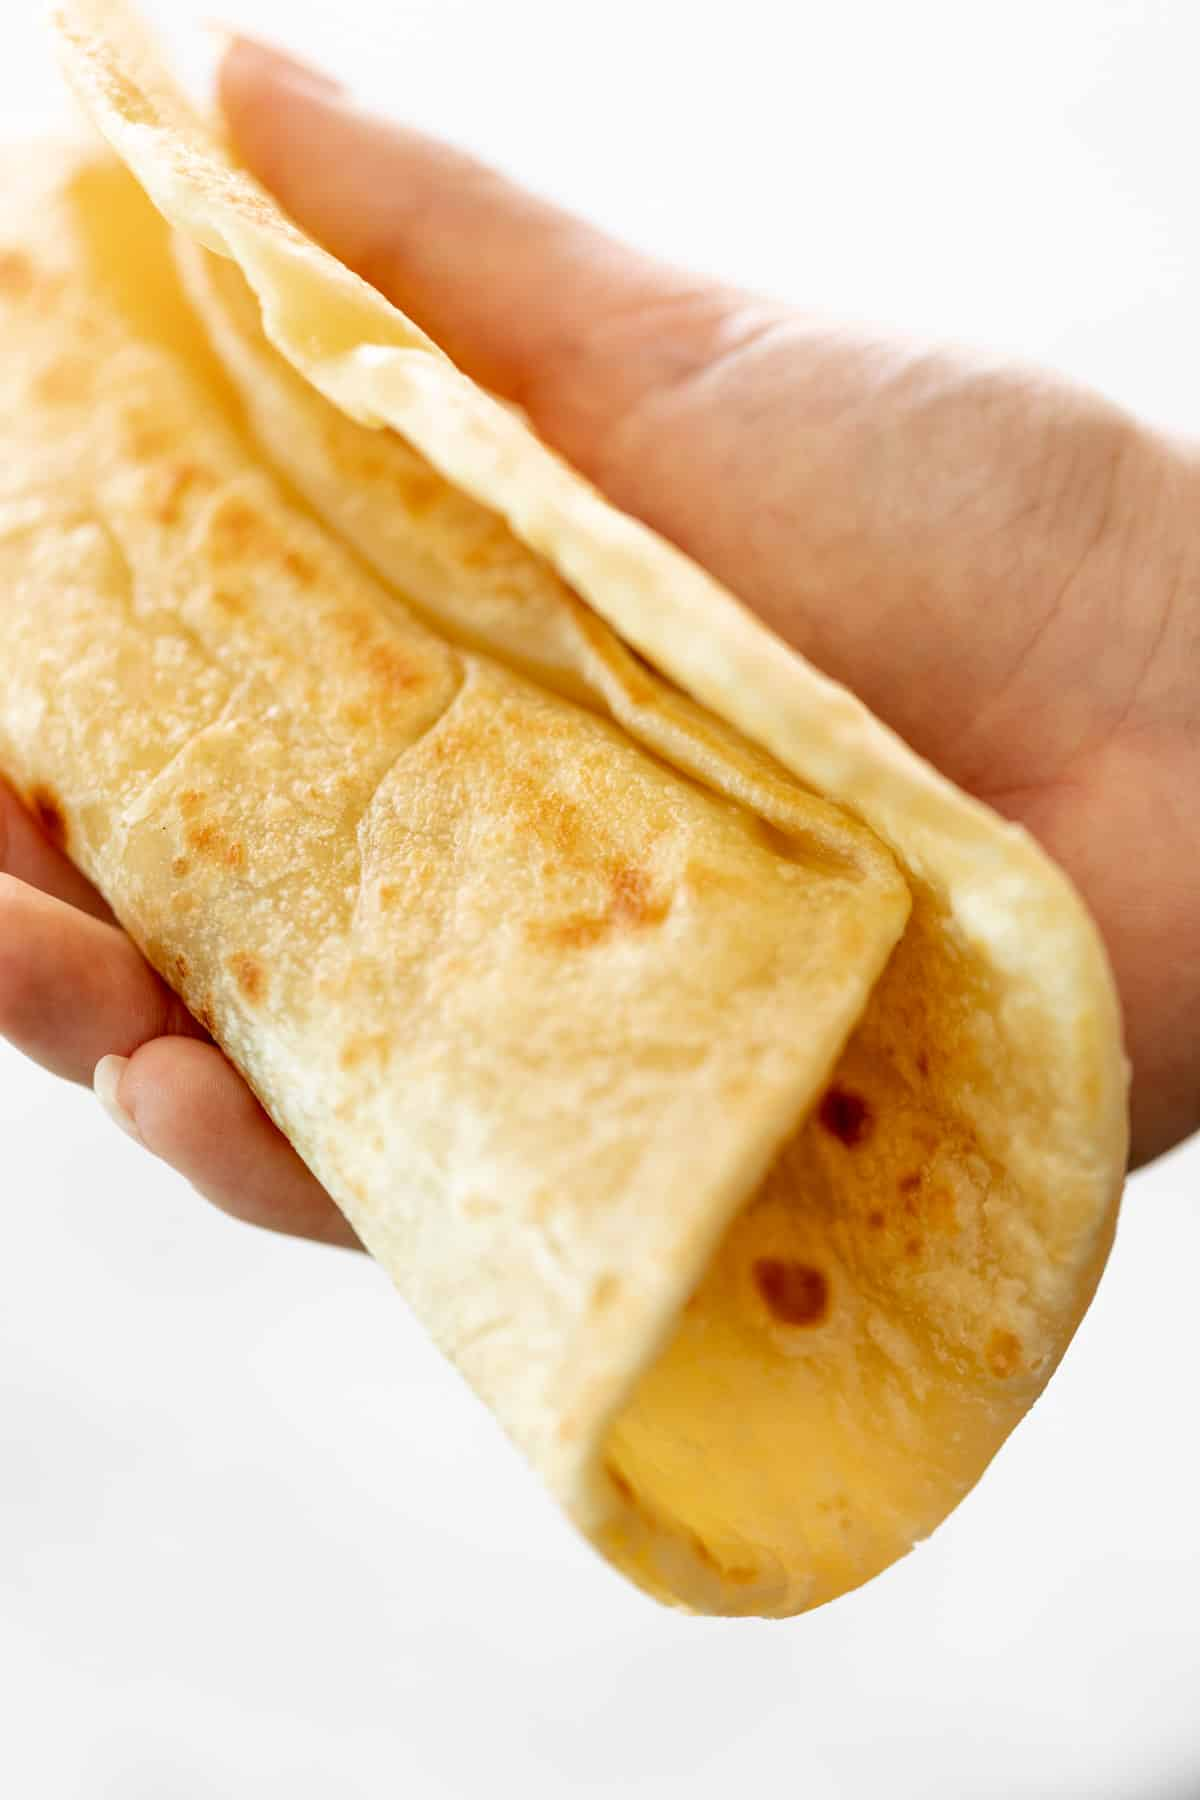 Holding a soft flatbread folded